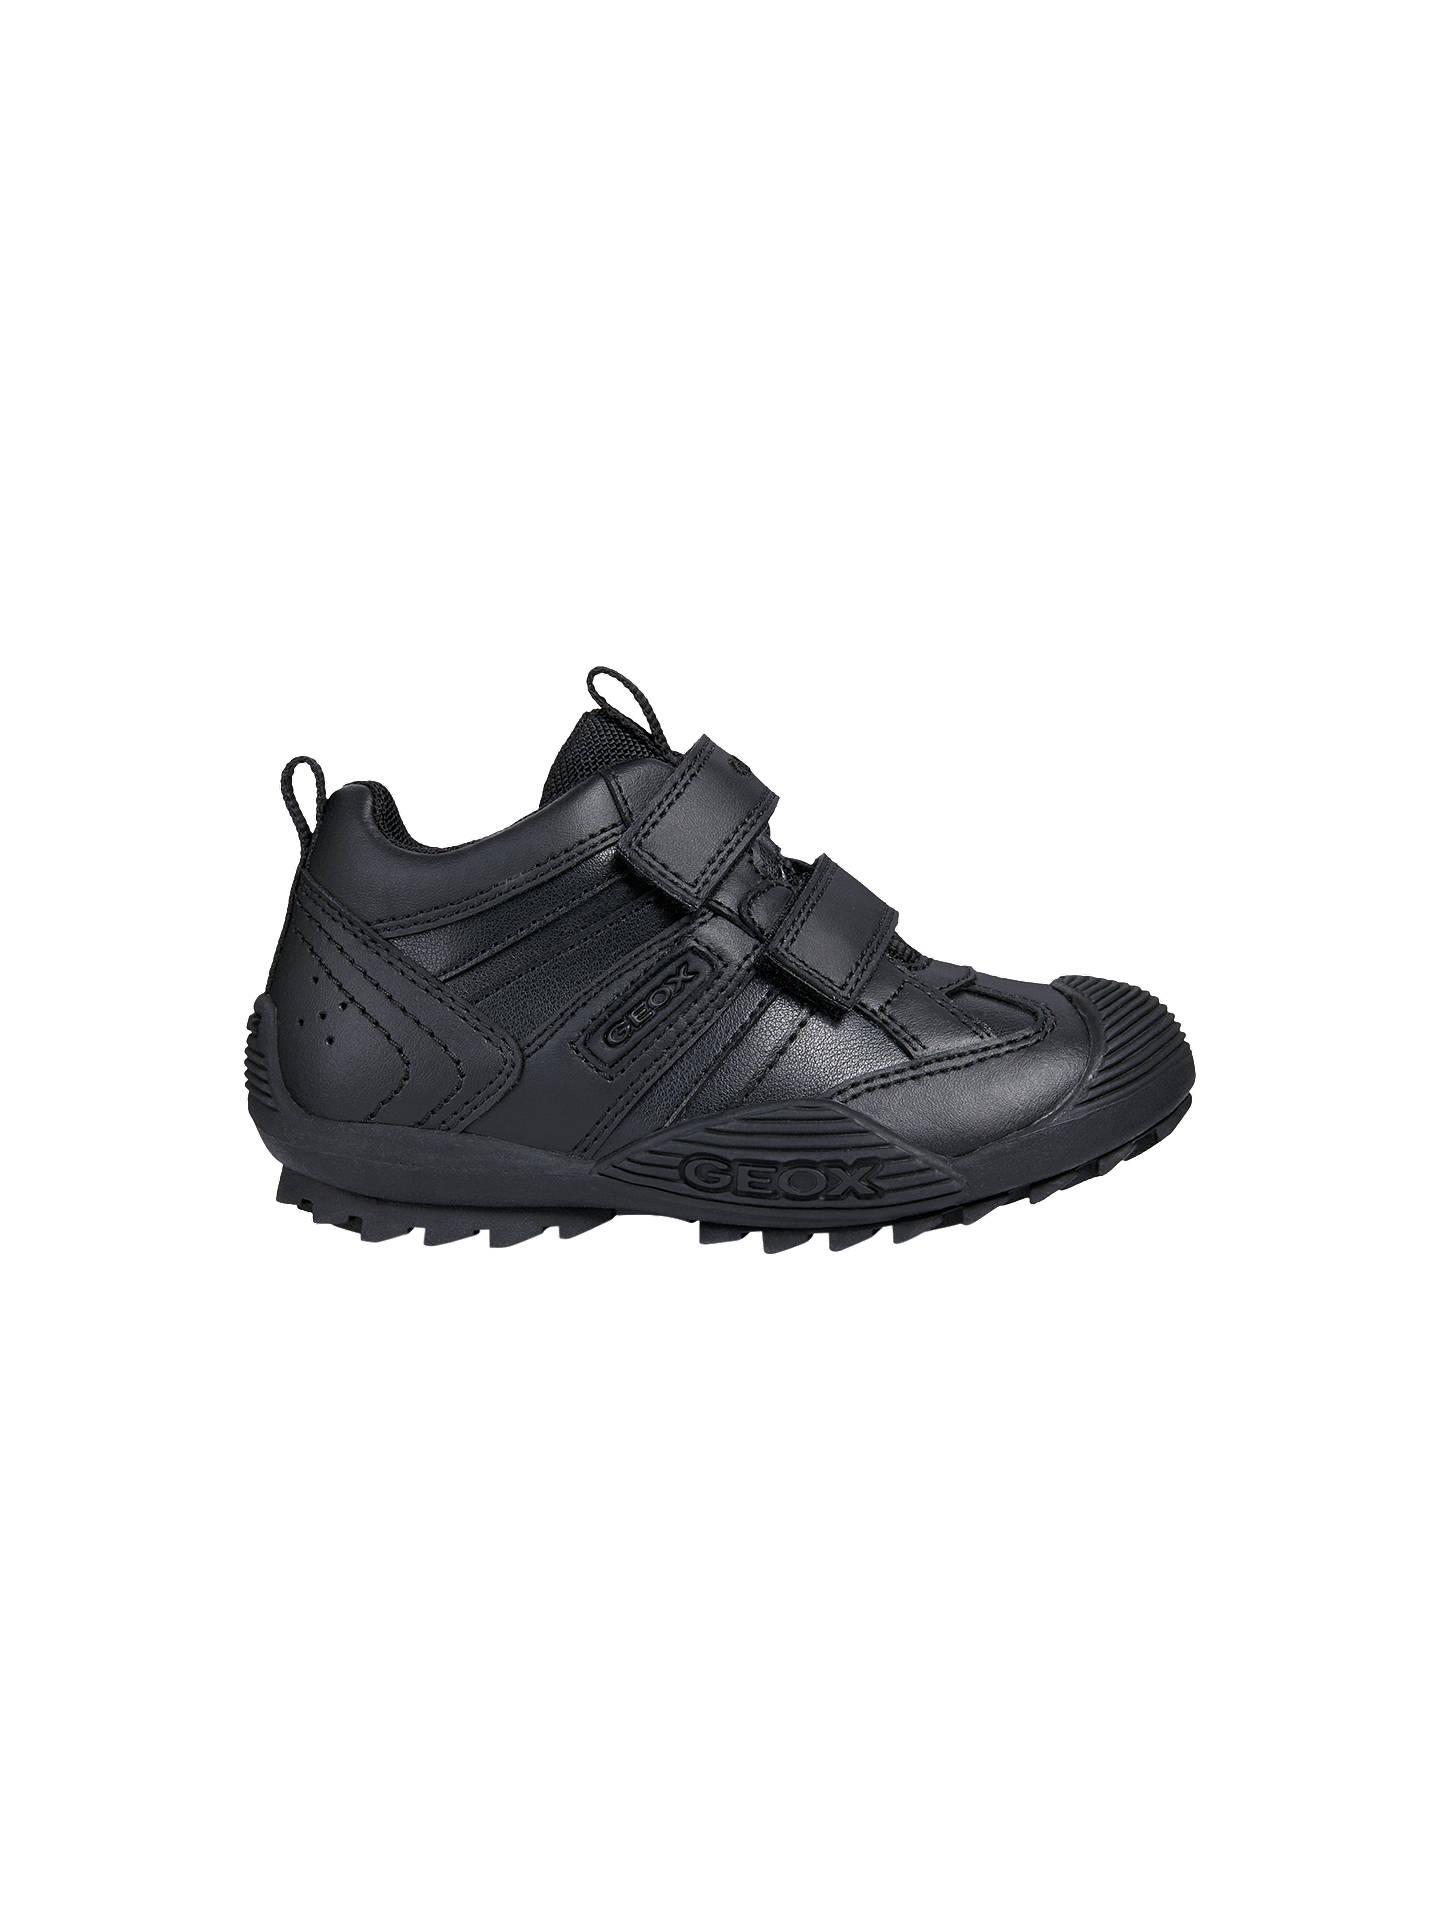 huge discount 20c41 88645 Geox Children's Savage Shoes, Black at John Lewis & Partners